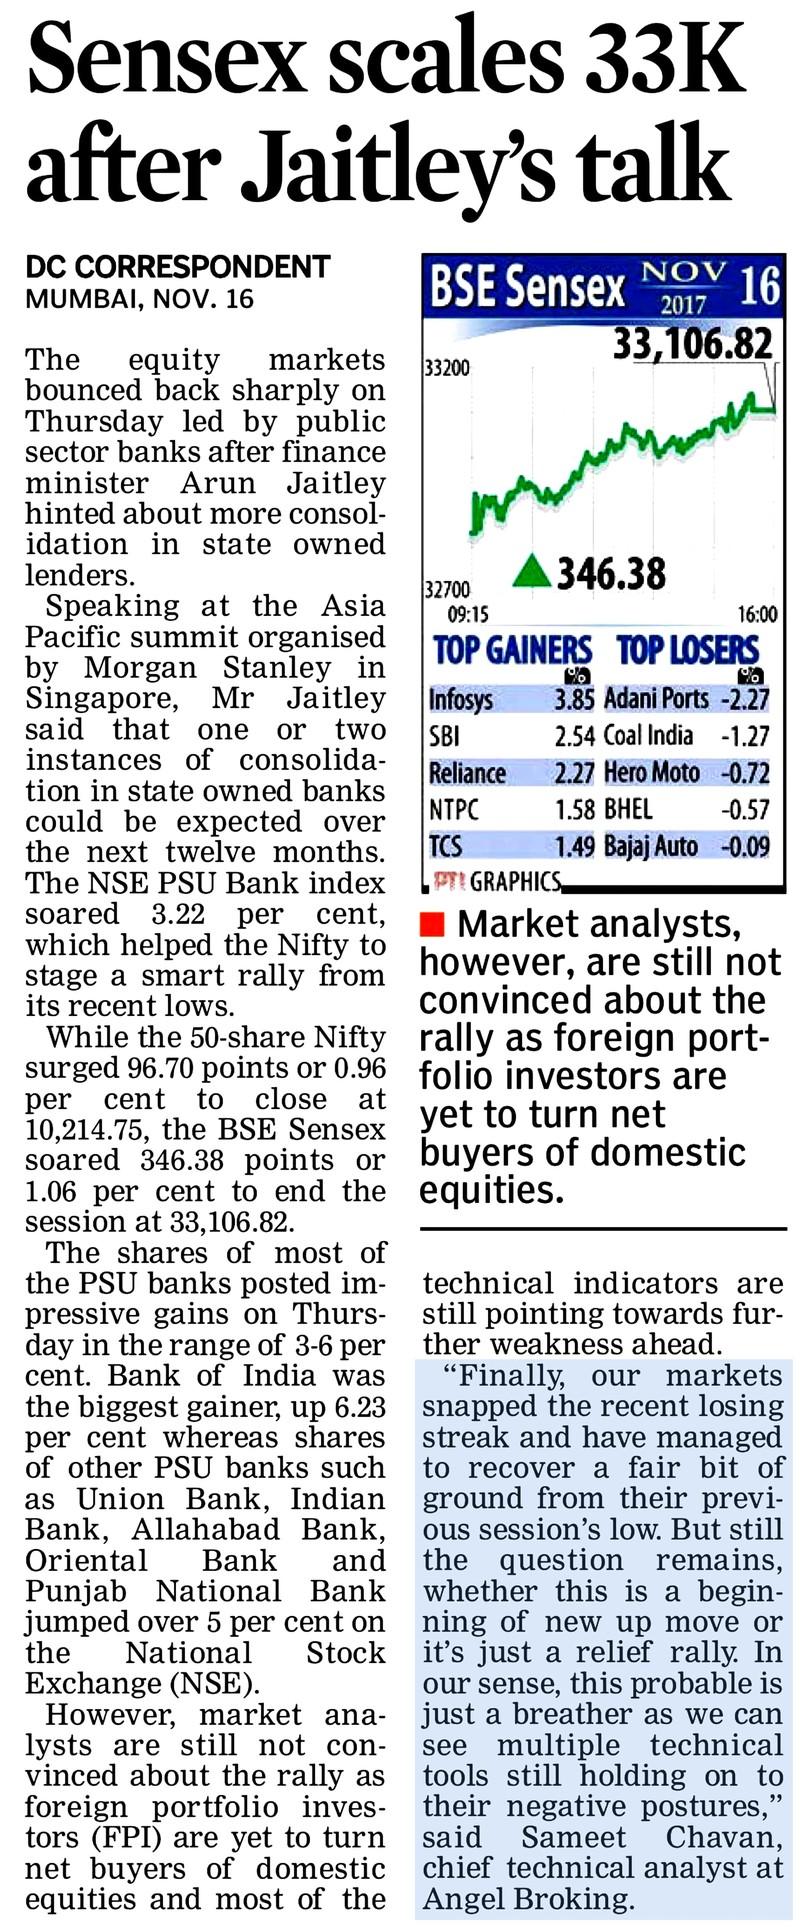 Sensex scales 33000 after Arun Jaitley's talk